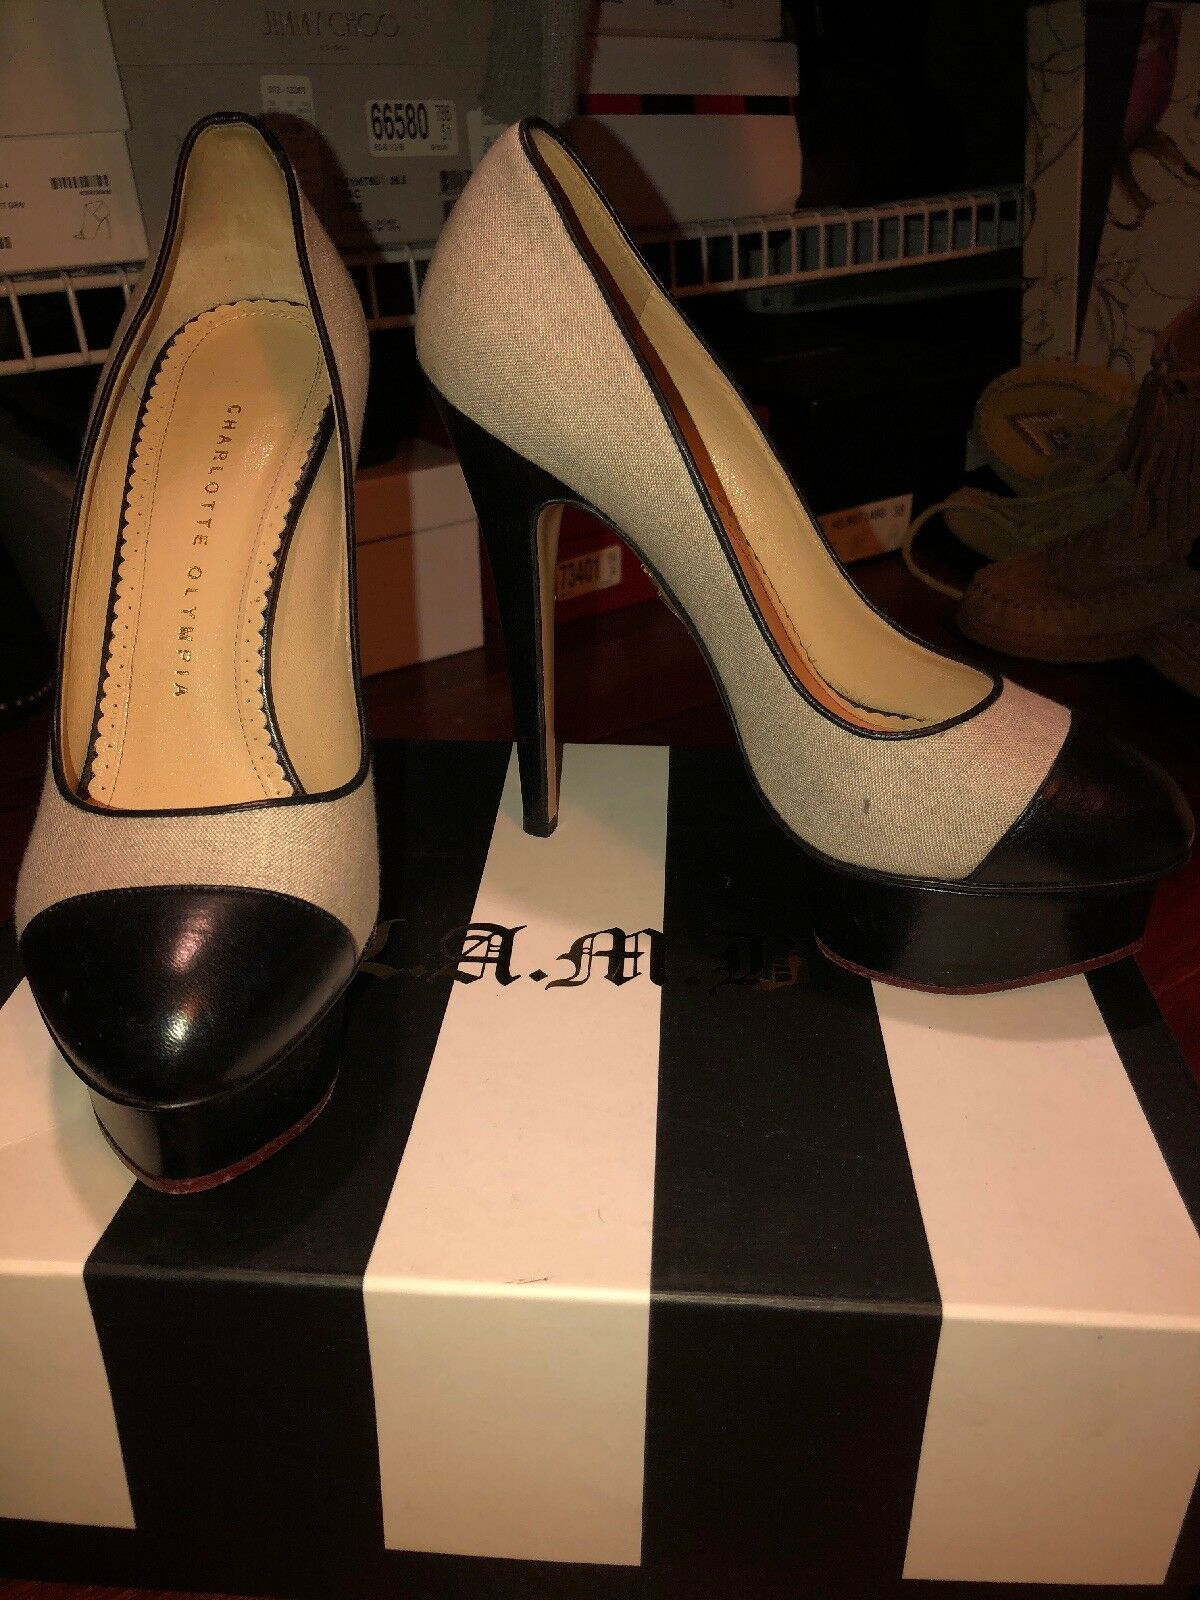 Men/Women Charlotte Olympia Pumps sell Brand Global sales